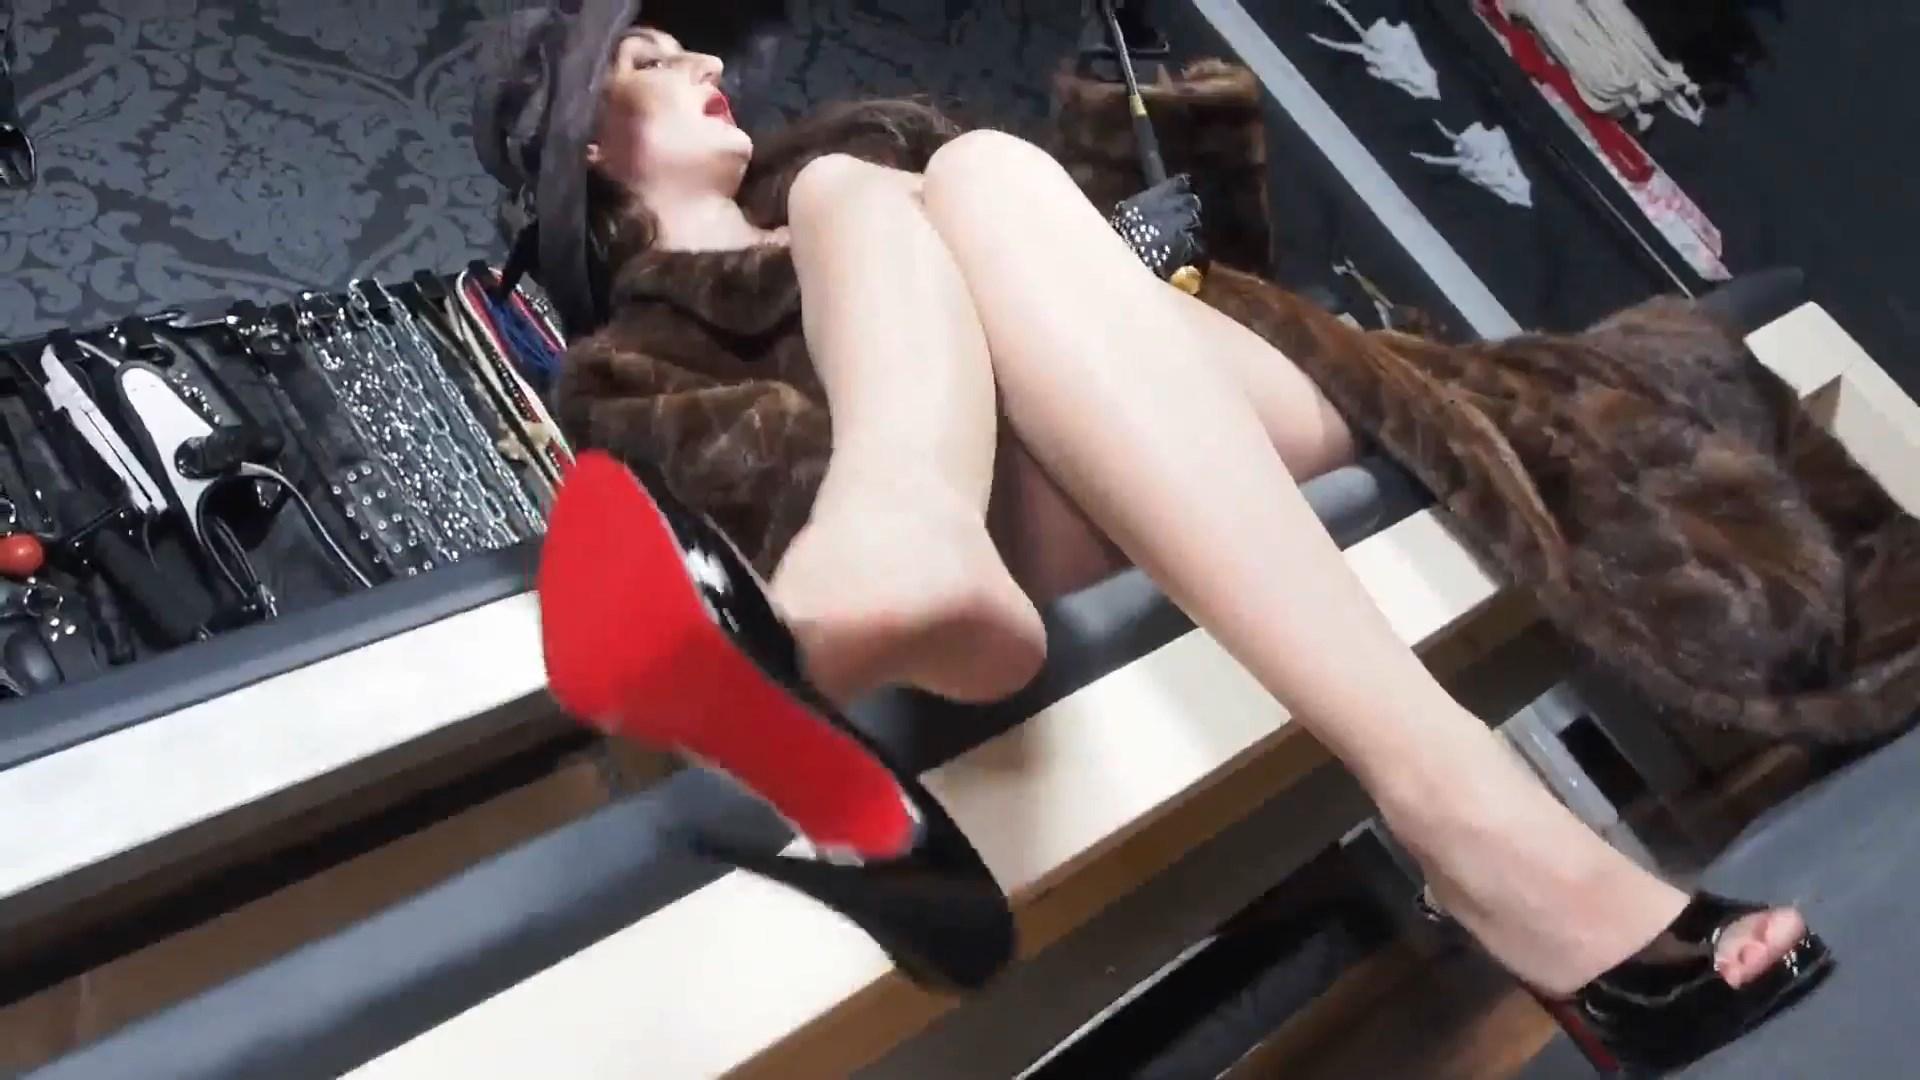 Horny Jerk Tasks Of Your Dangling Fur Mistress - LADY VICTORIA VALENTE - FULL HD/1080p/MP4